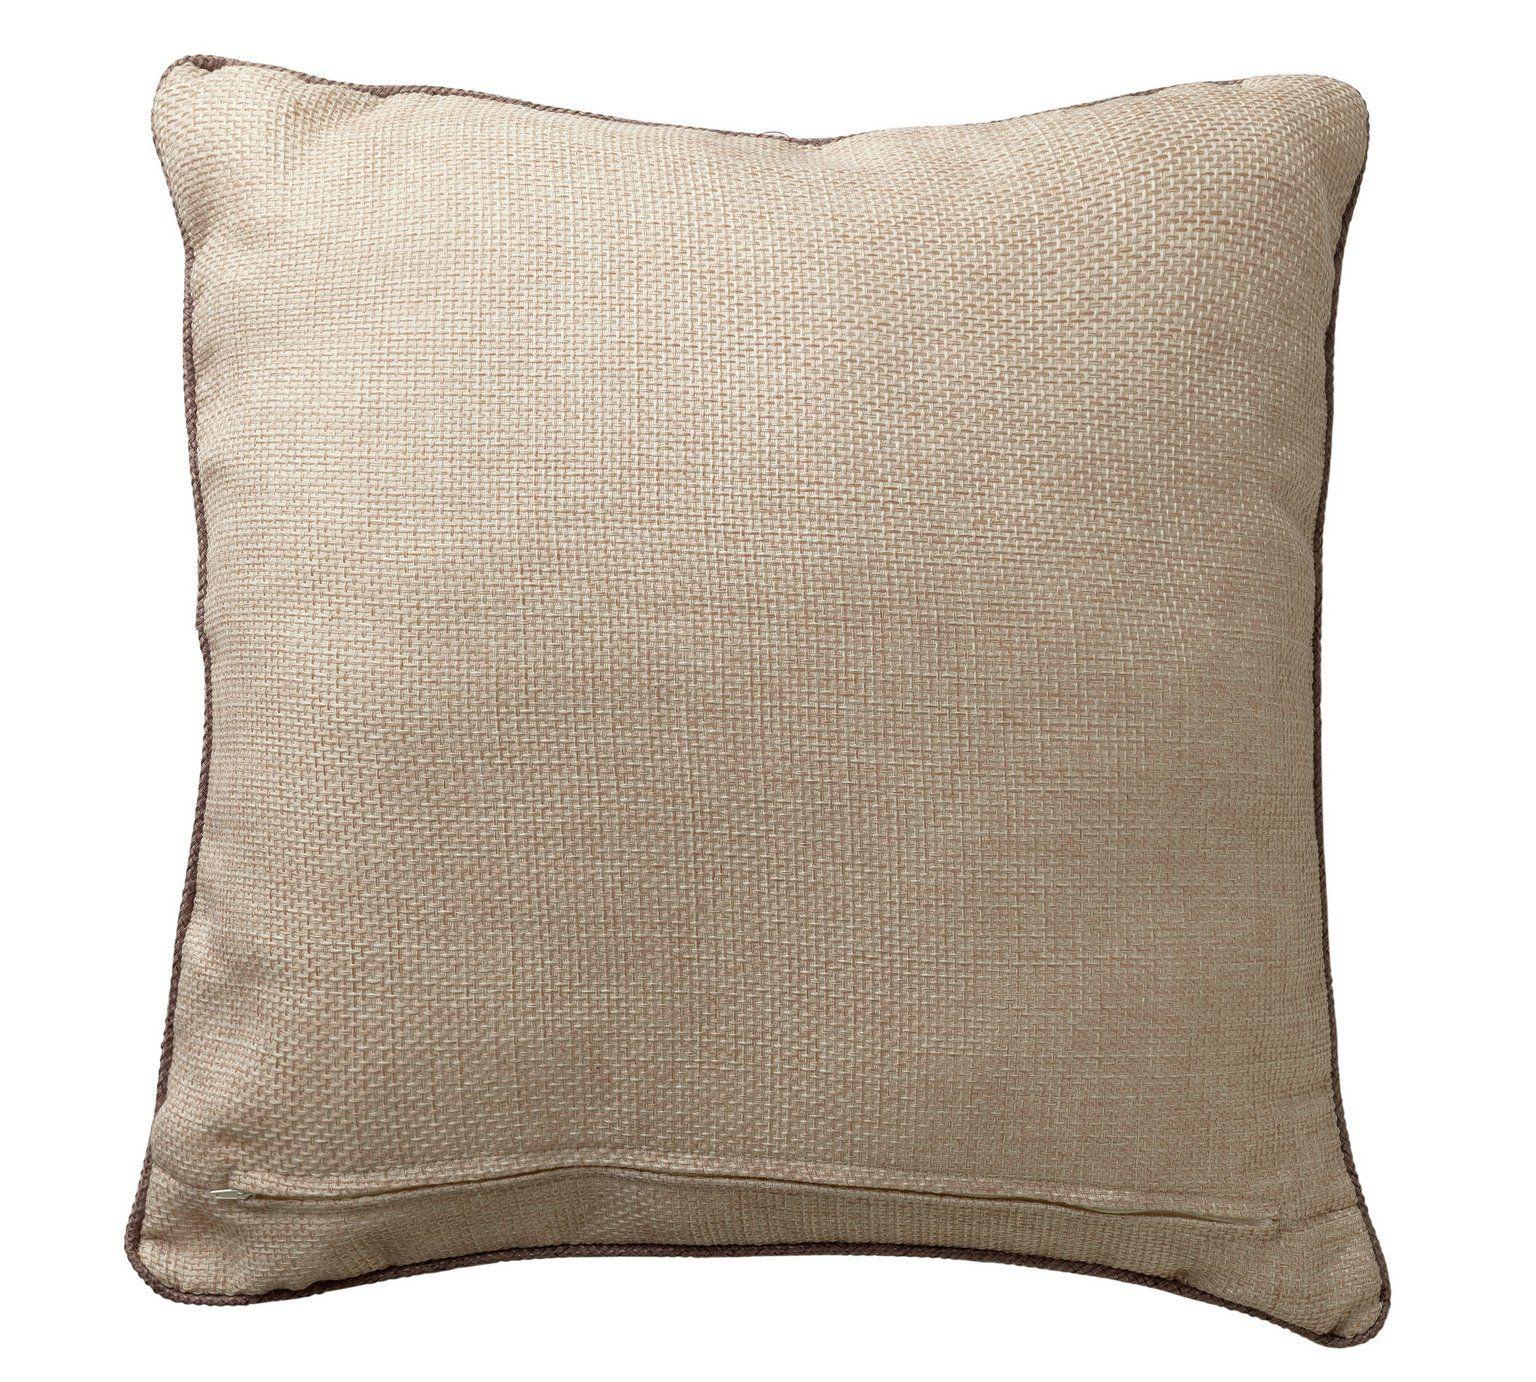 Buy Heart of House Hudson Large Cushion Oatmeal at Argos